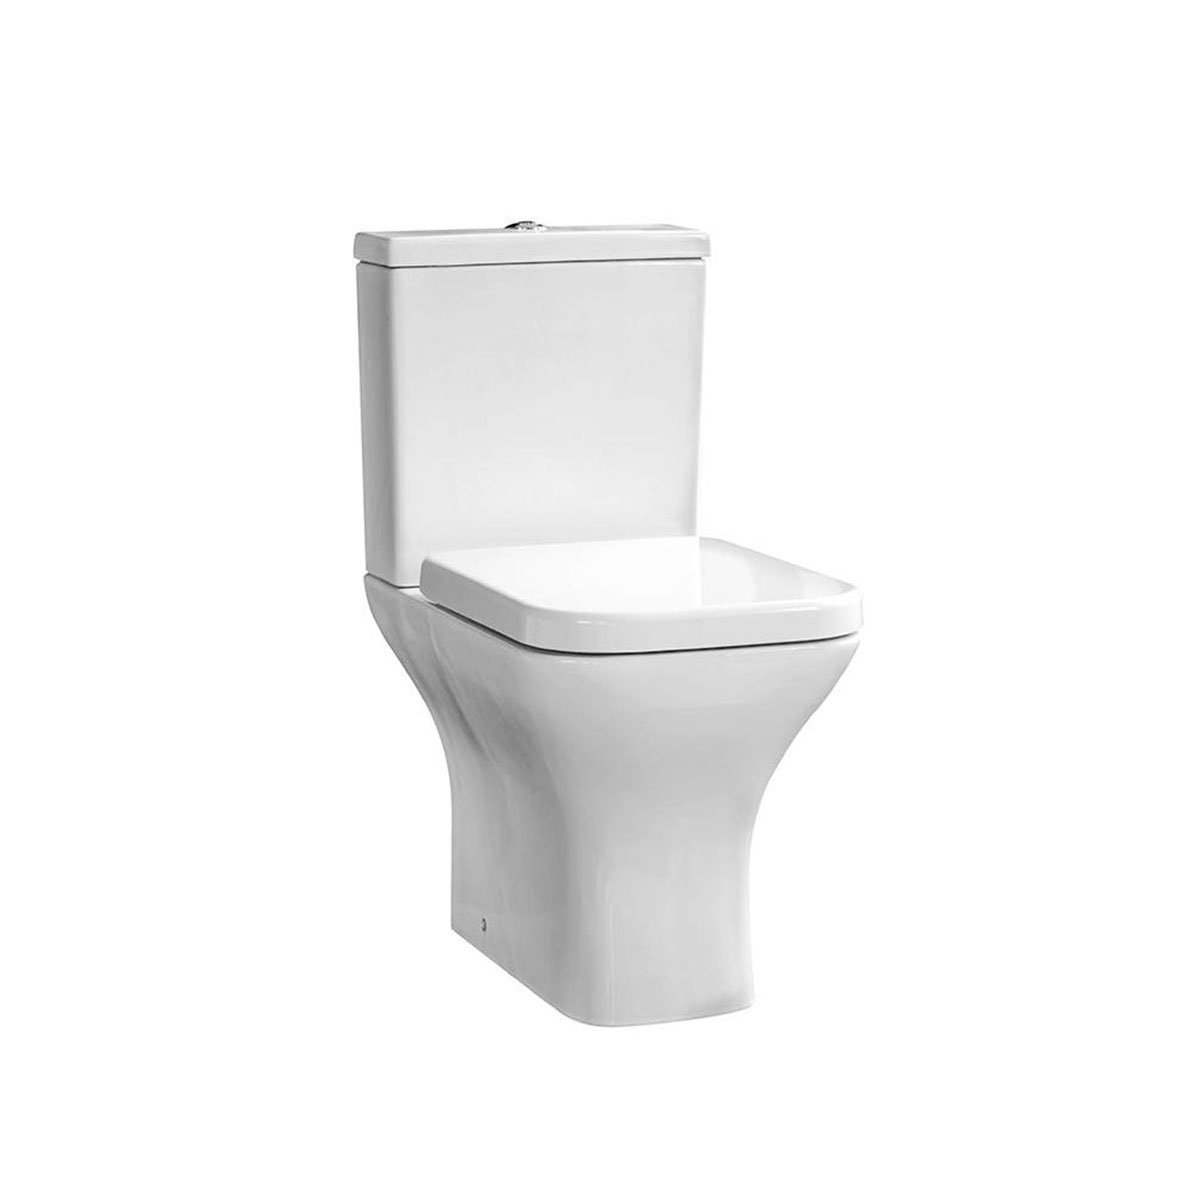 LUXURY SANITARYWARE two piece wc